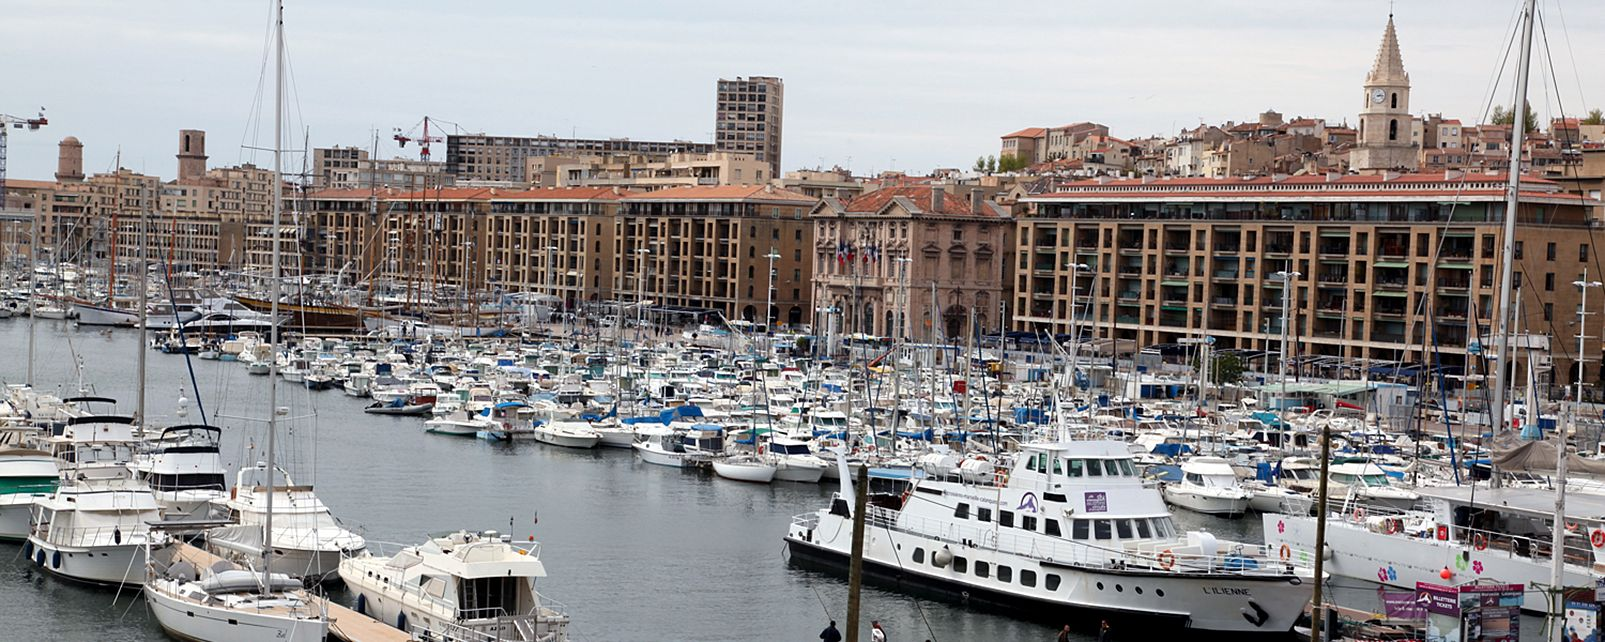 H tel grand beauvau marseille vieux port marseille france - Grand hotel beauvau marseille vieux port ...